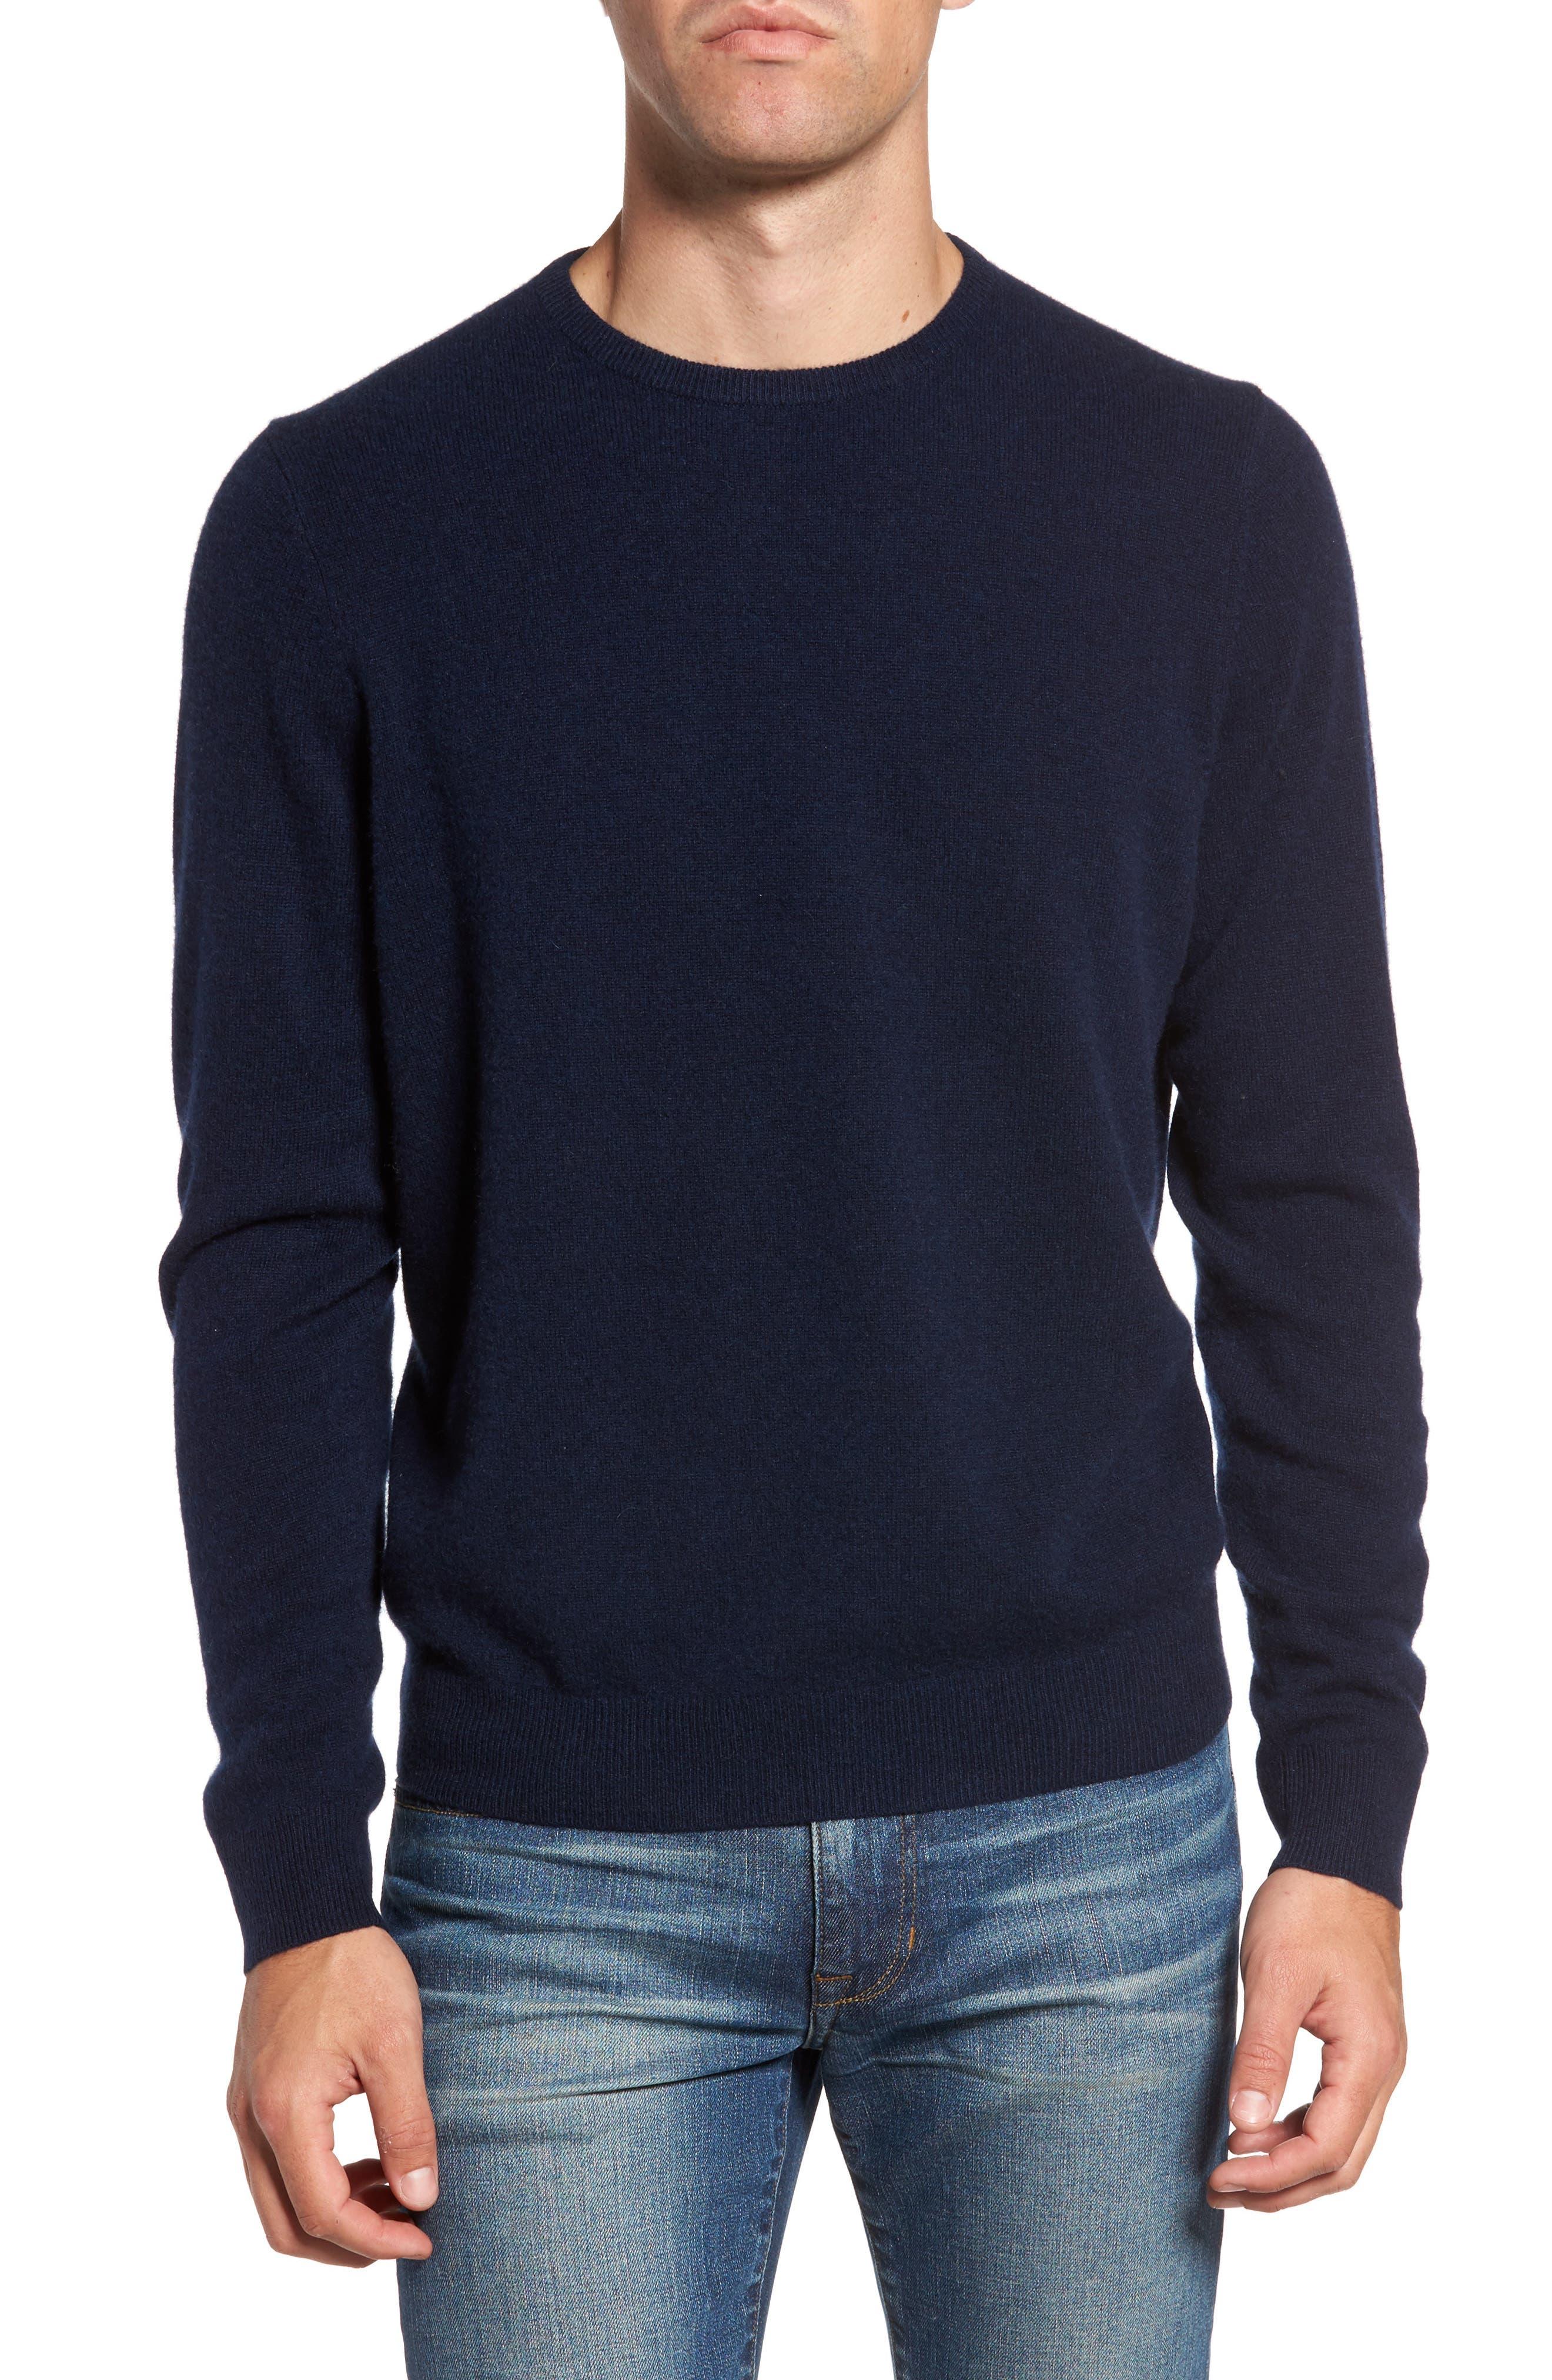 Cashmere Crewneck Sweater,                         Main,                         color, Navy Charcoal